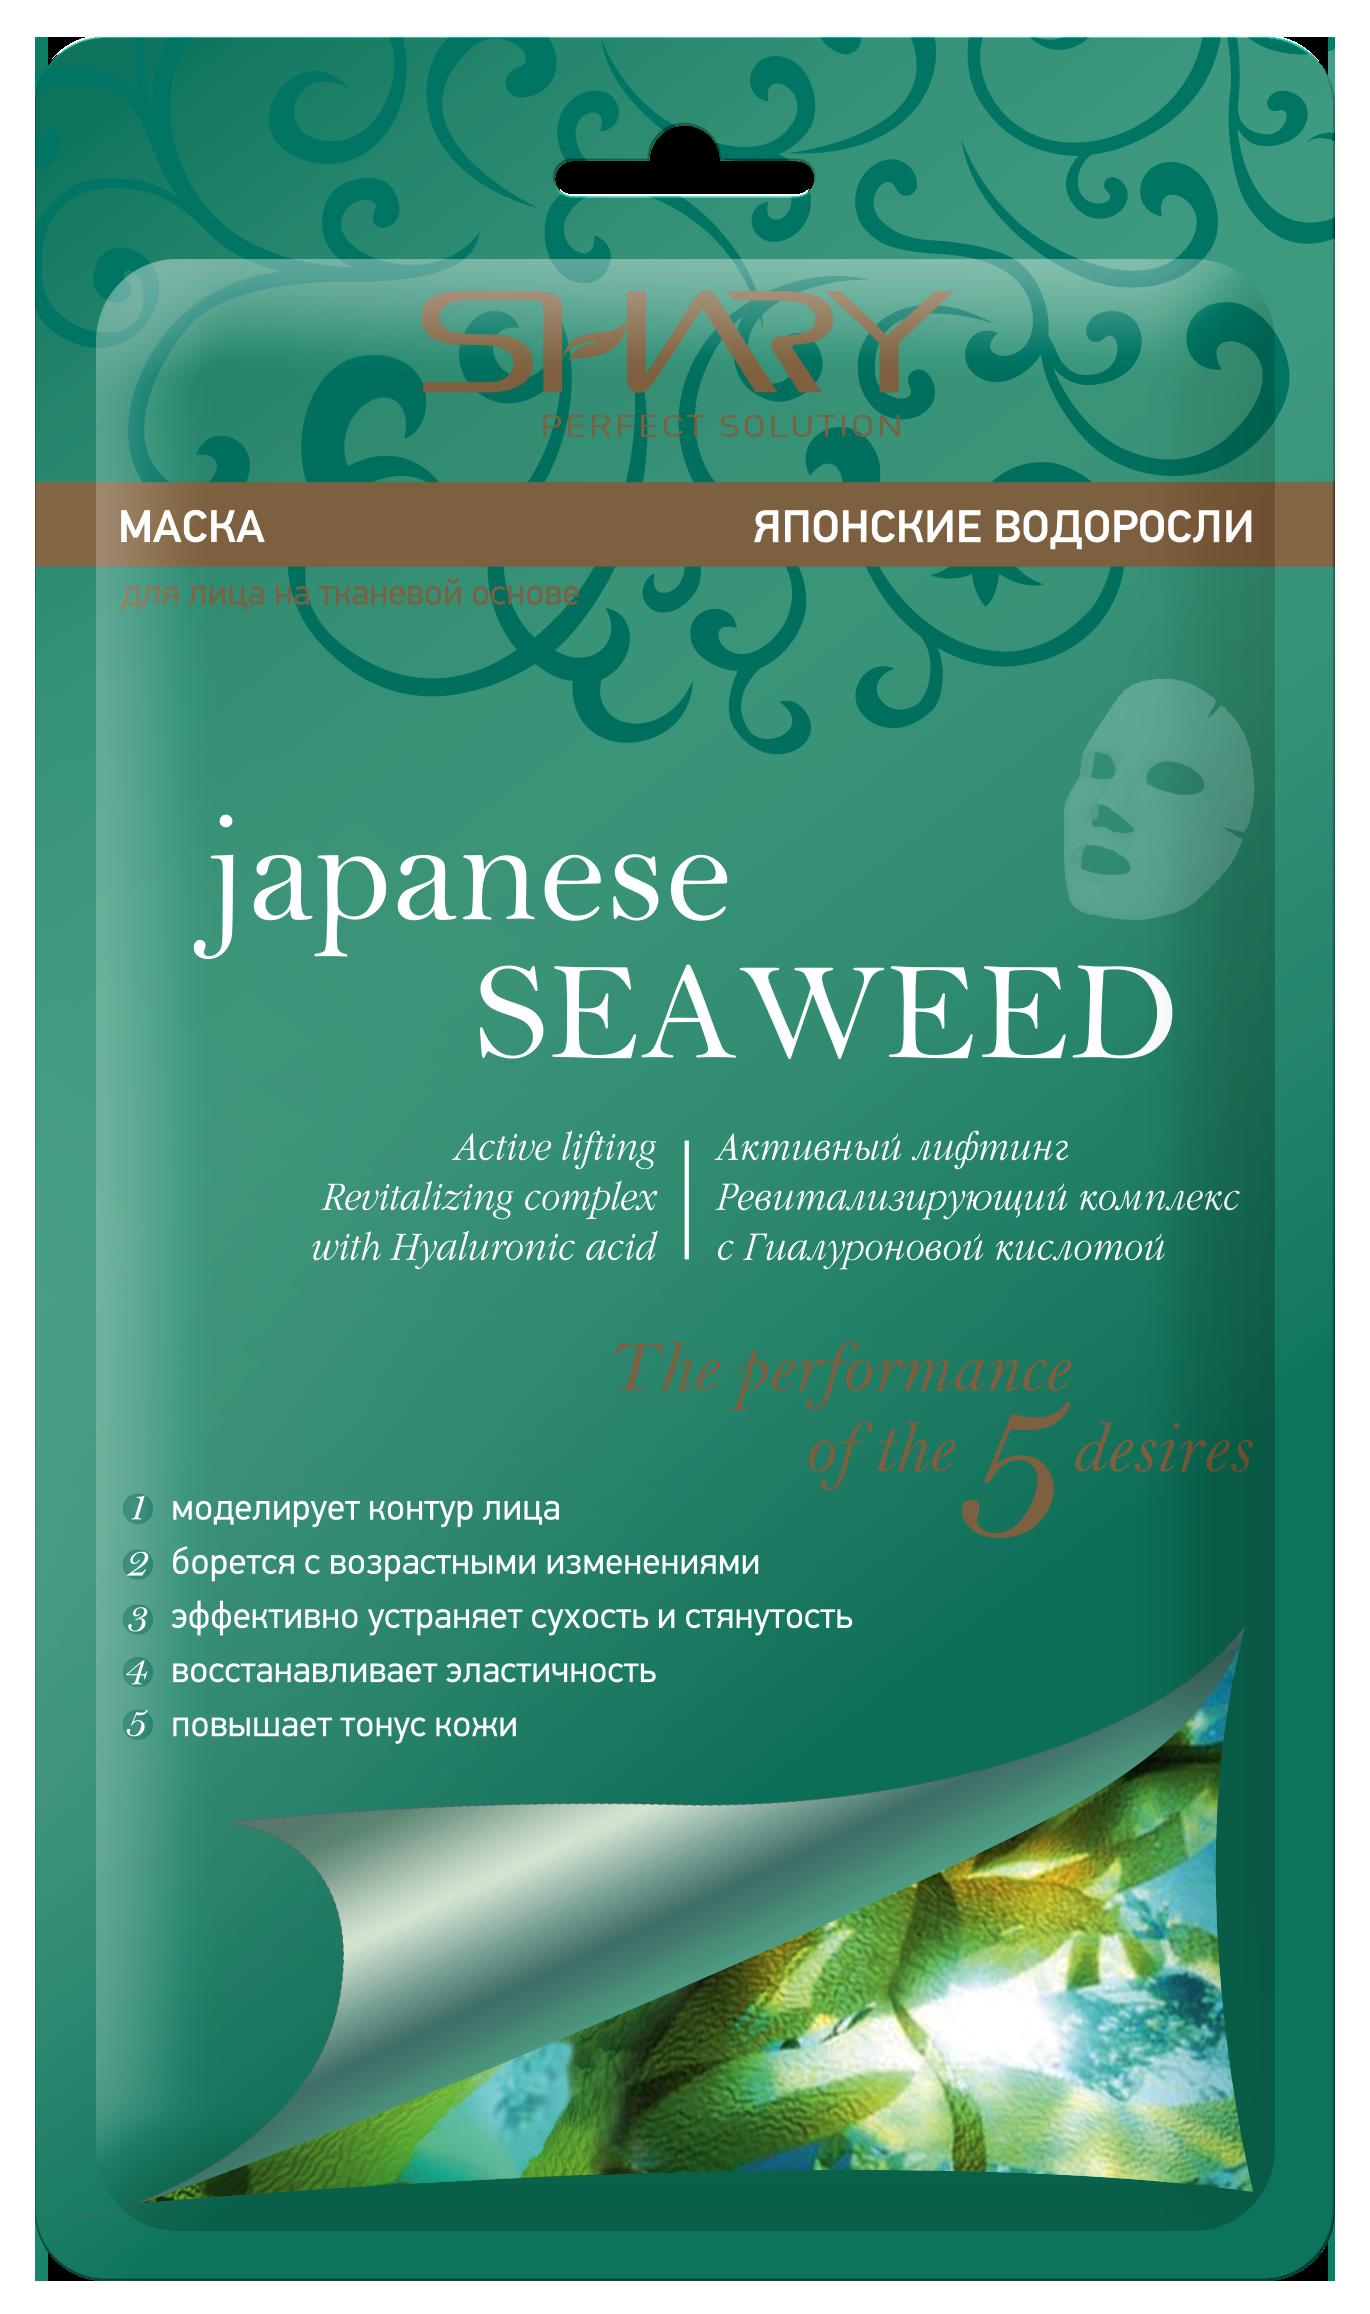 SHARY Маска для лица на тканевой основе Японские водоросли / SHARY 20 гр